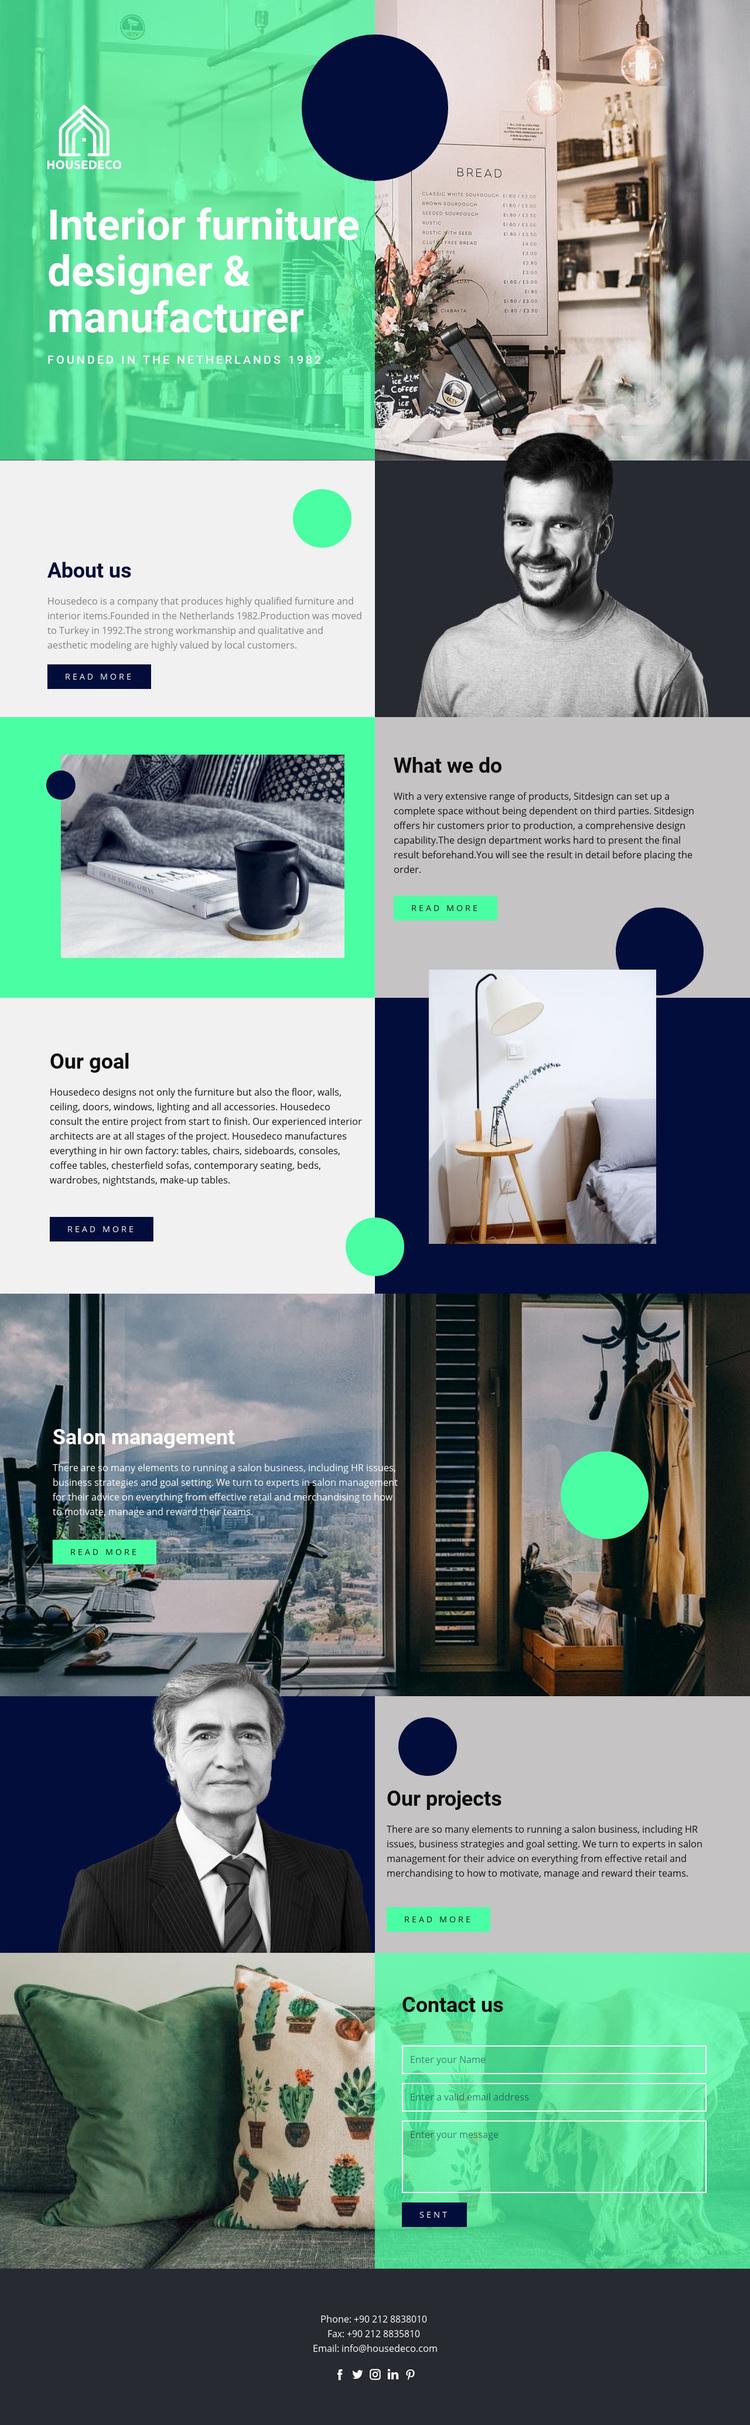 Interior furniture Web Page Designer